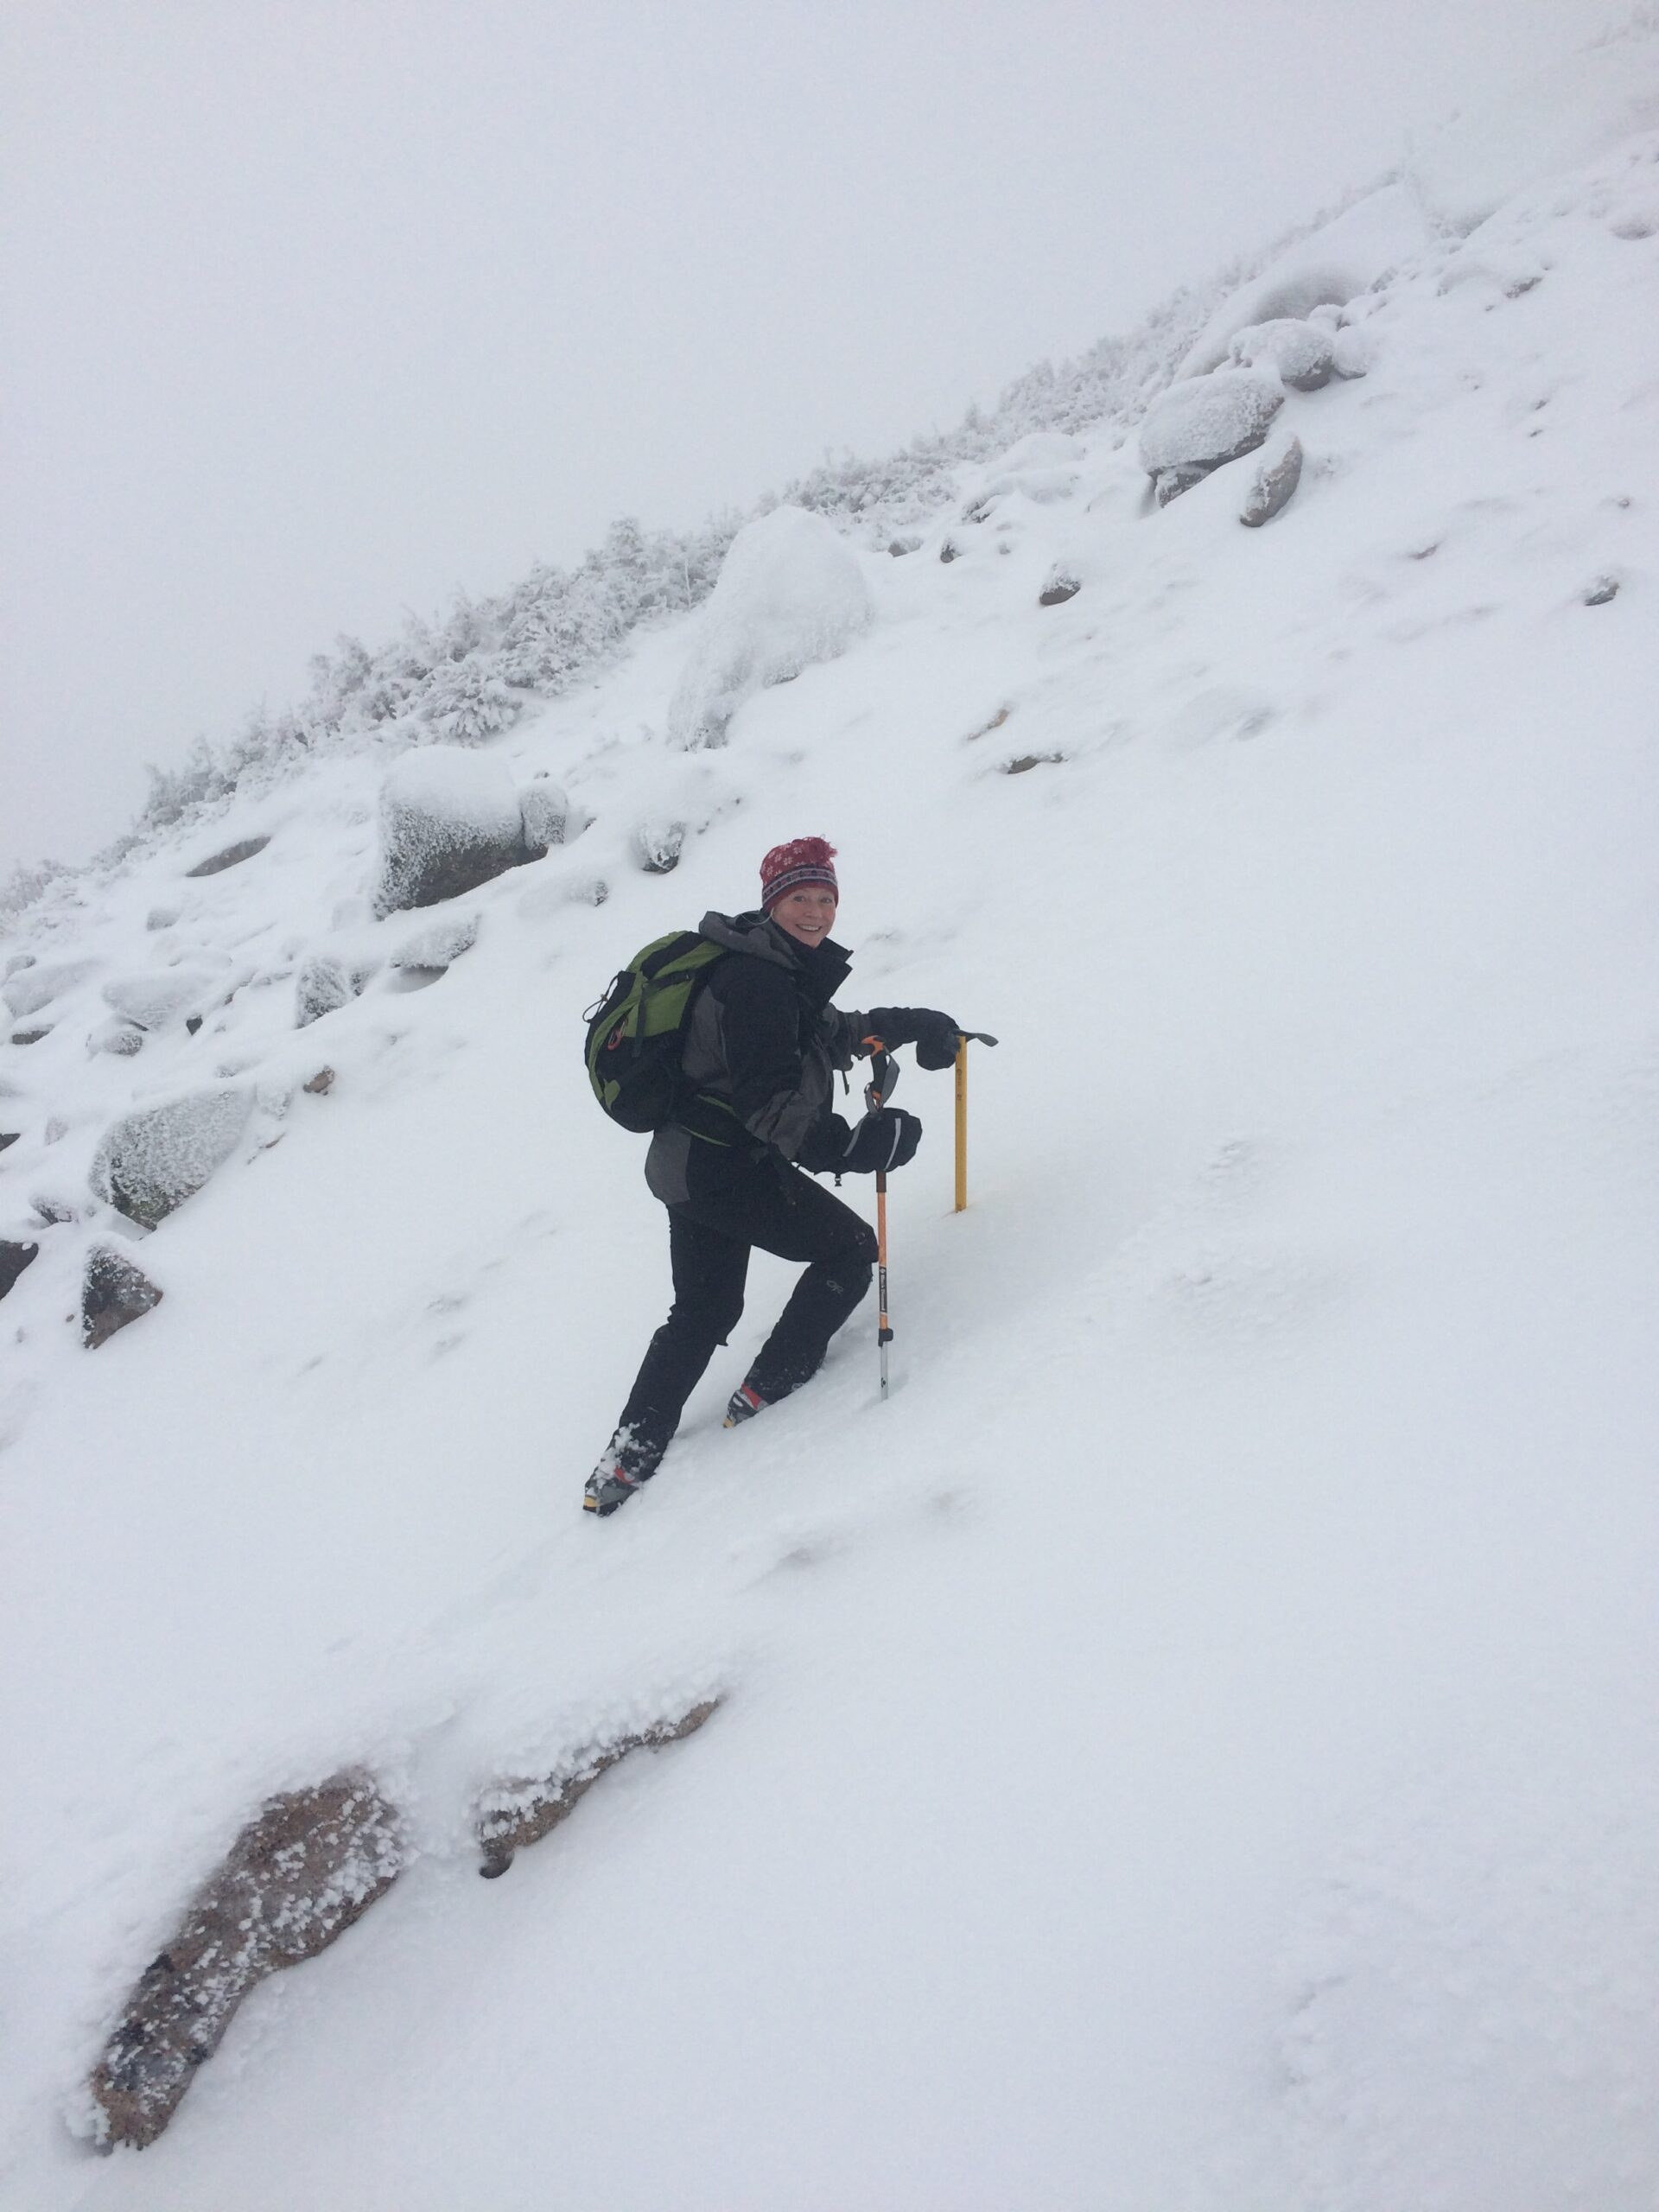 Onward through the snowfields